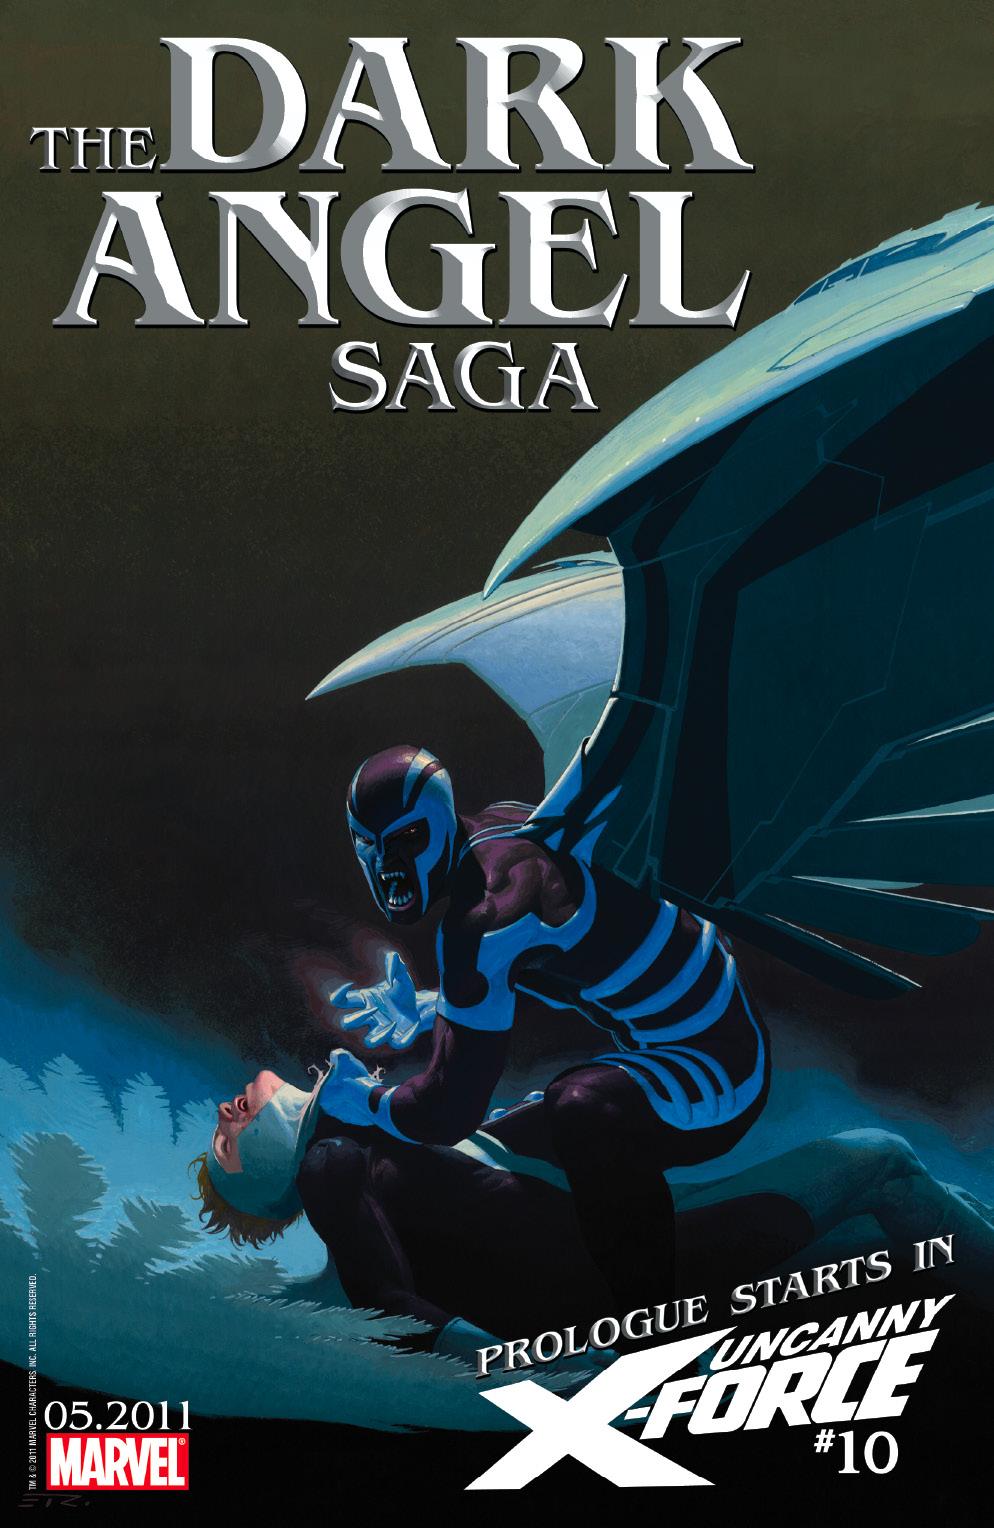 DarkAngelSaga The Dark Angel Saga Begins at C2E2 2011